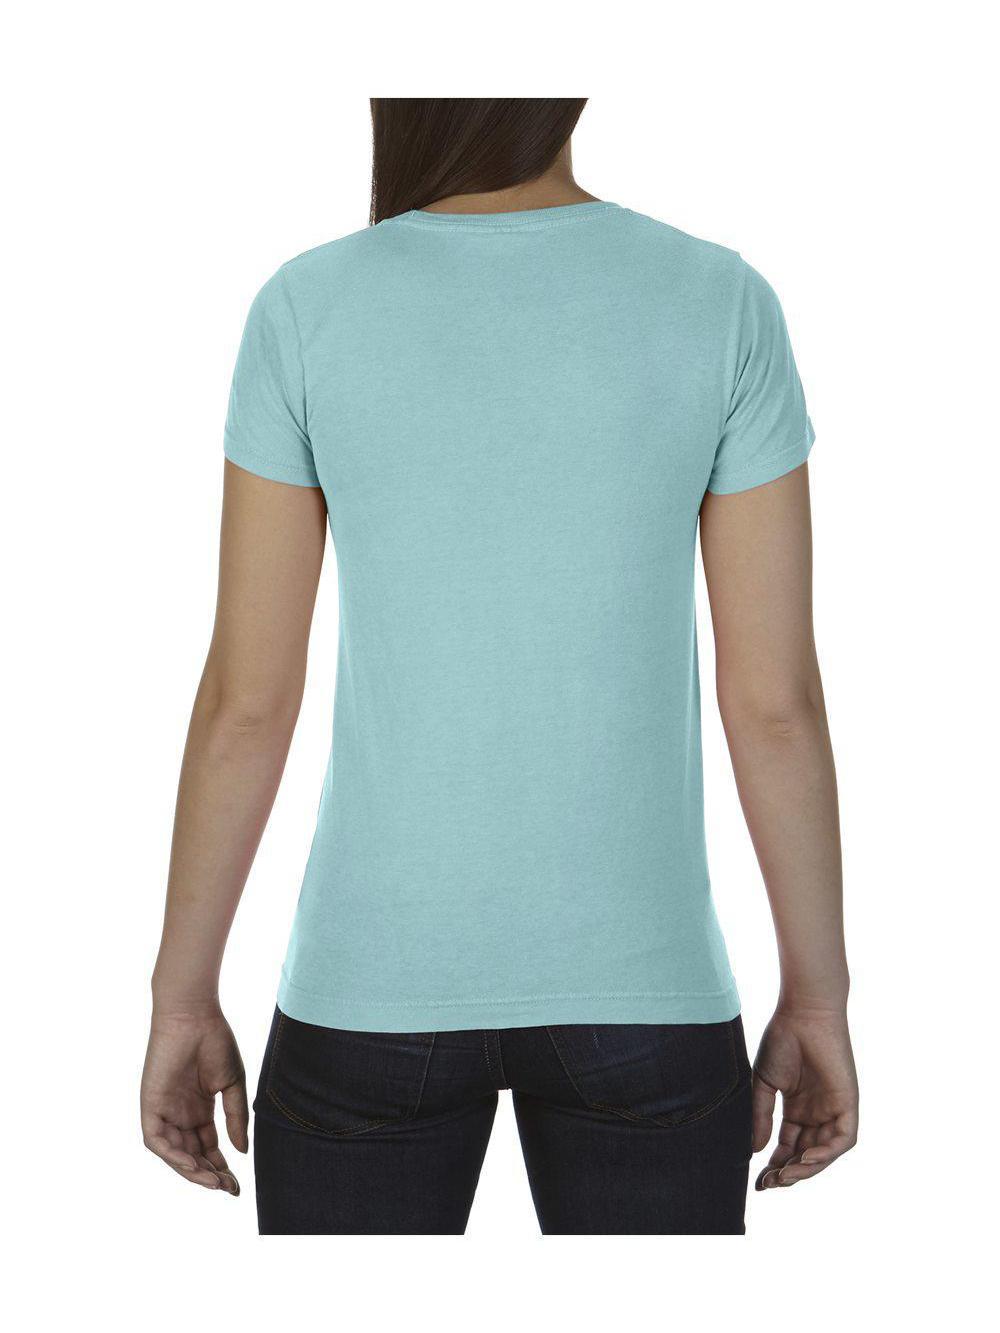 Comfort-Colors-Pigment-Dyed-Ringspun-Women-039-s-Short-Sleeve-T-Shirt-3333 thumbnail 9